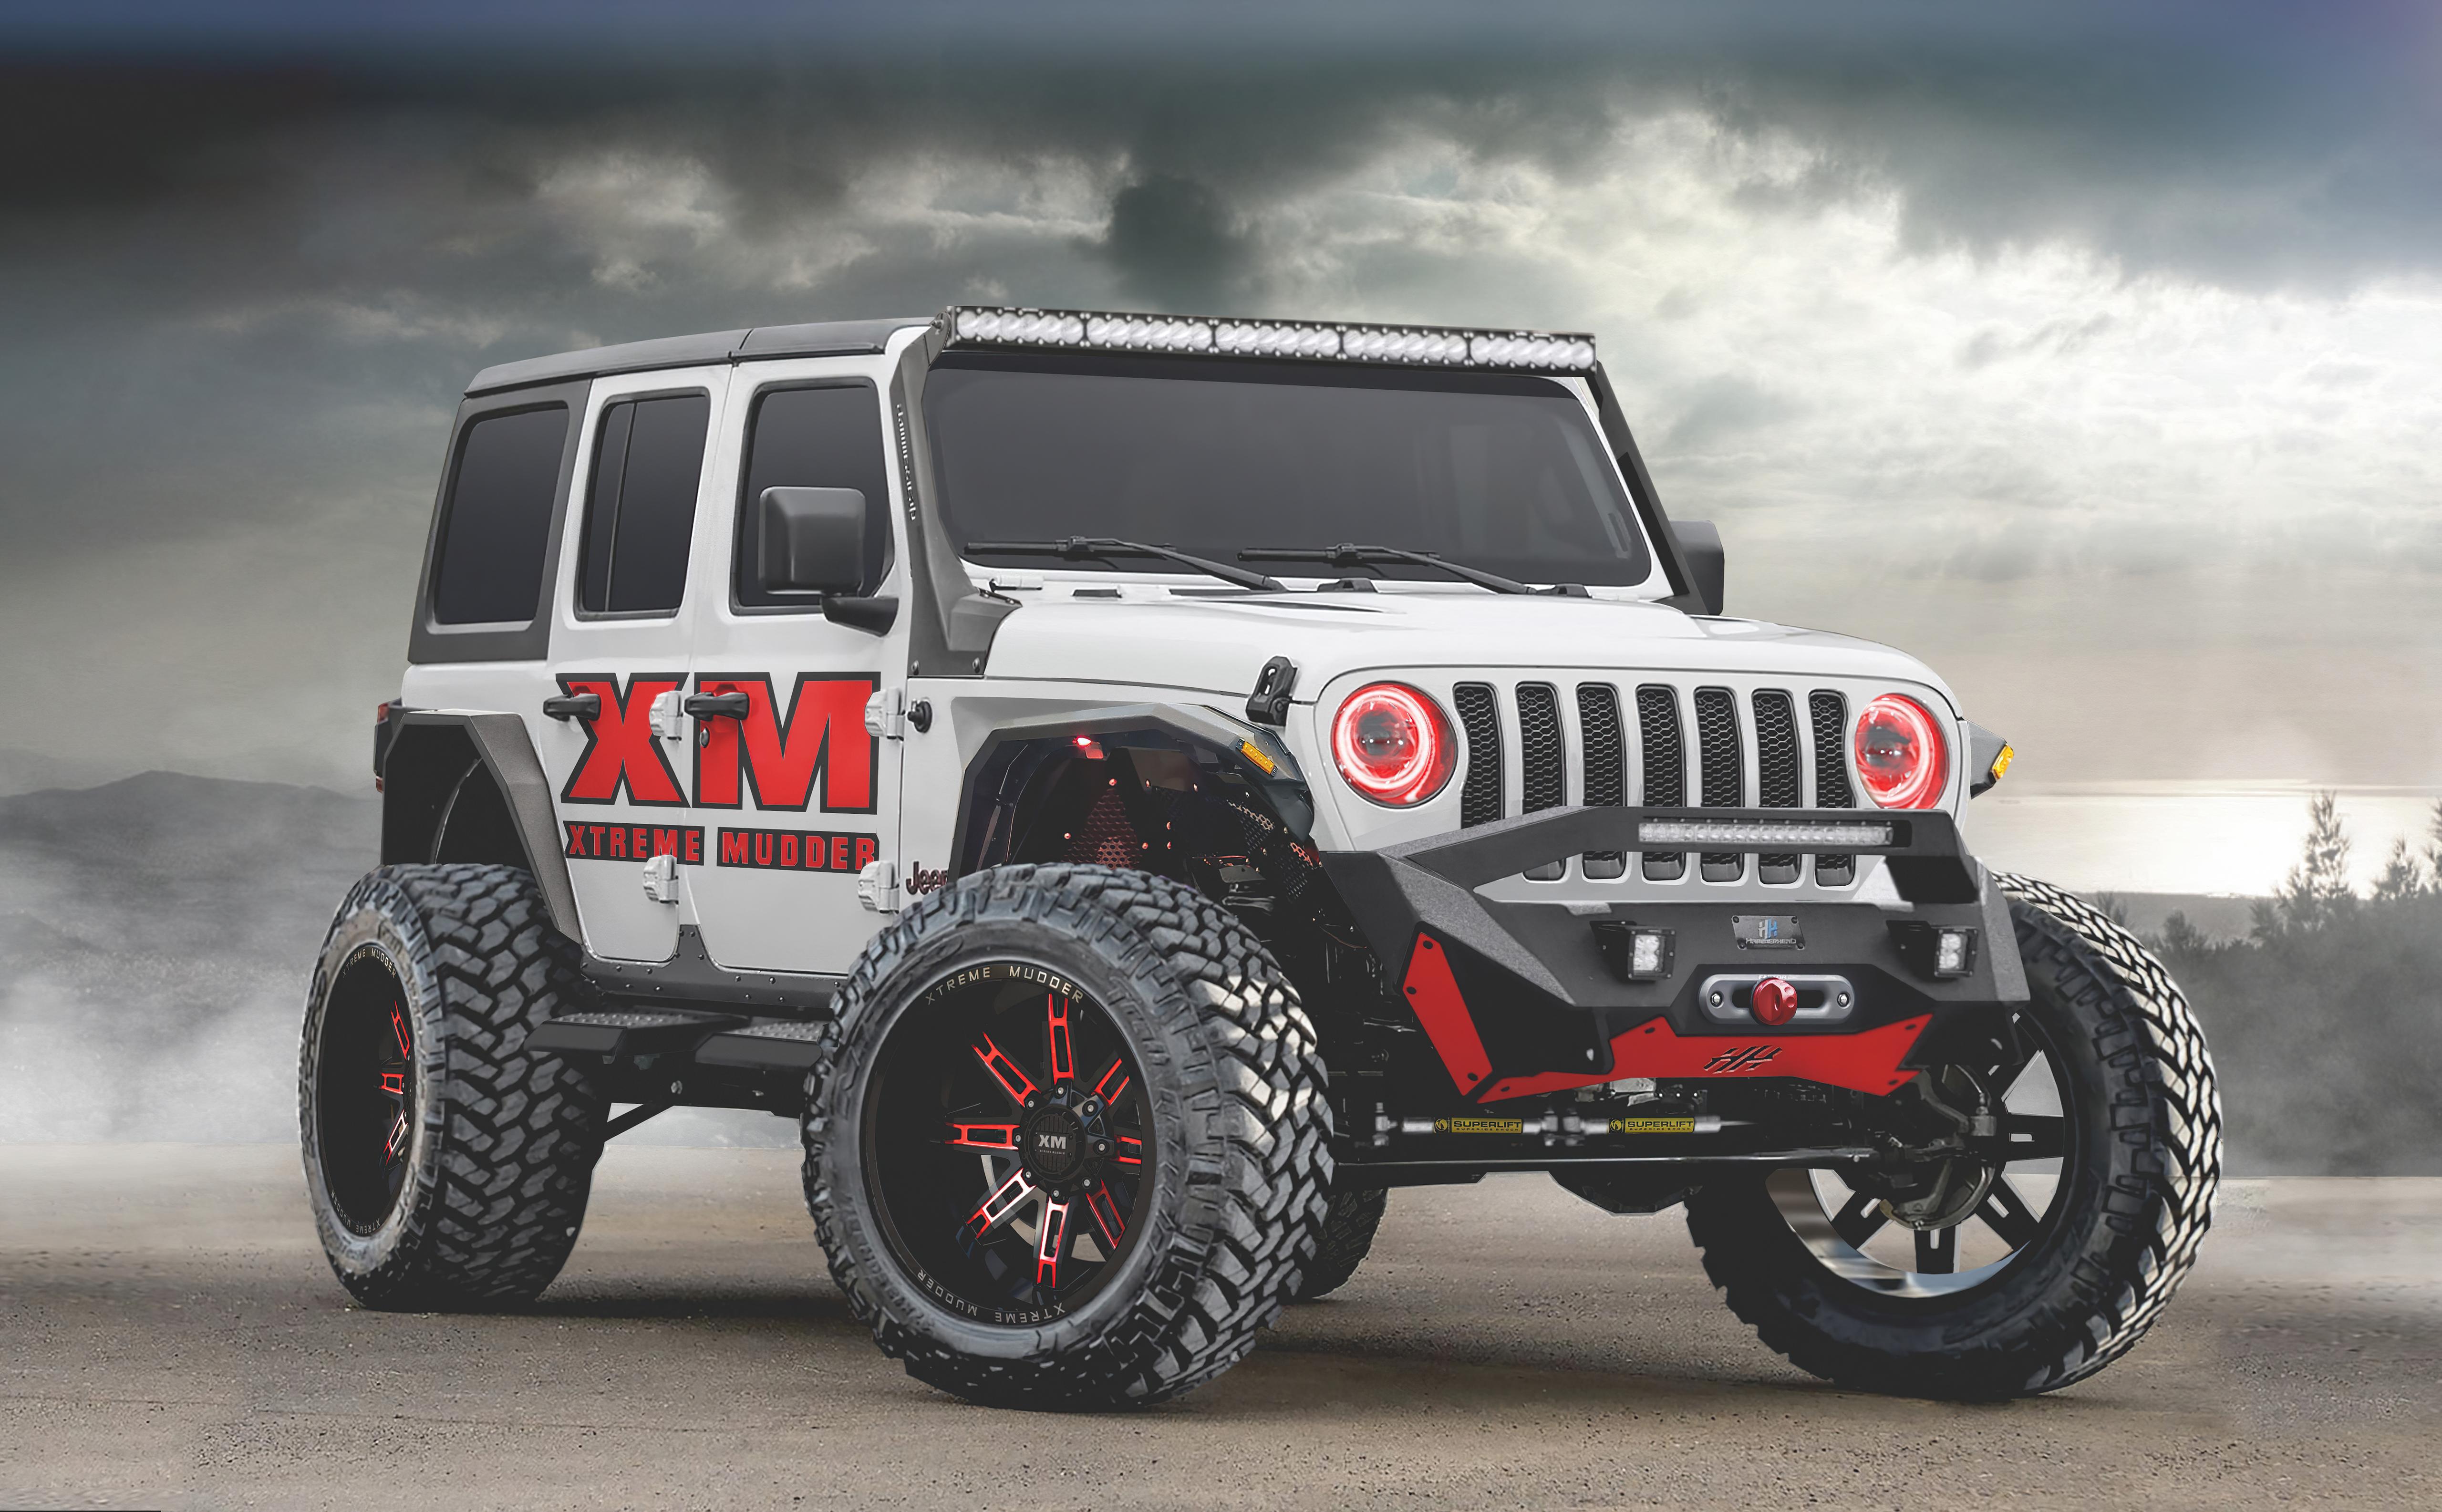 jeep extreme mudder 4k 1626180010 - Jeep Extreme Mudder 4k - Jeep Extreme Mudder 4k wallpapers